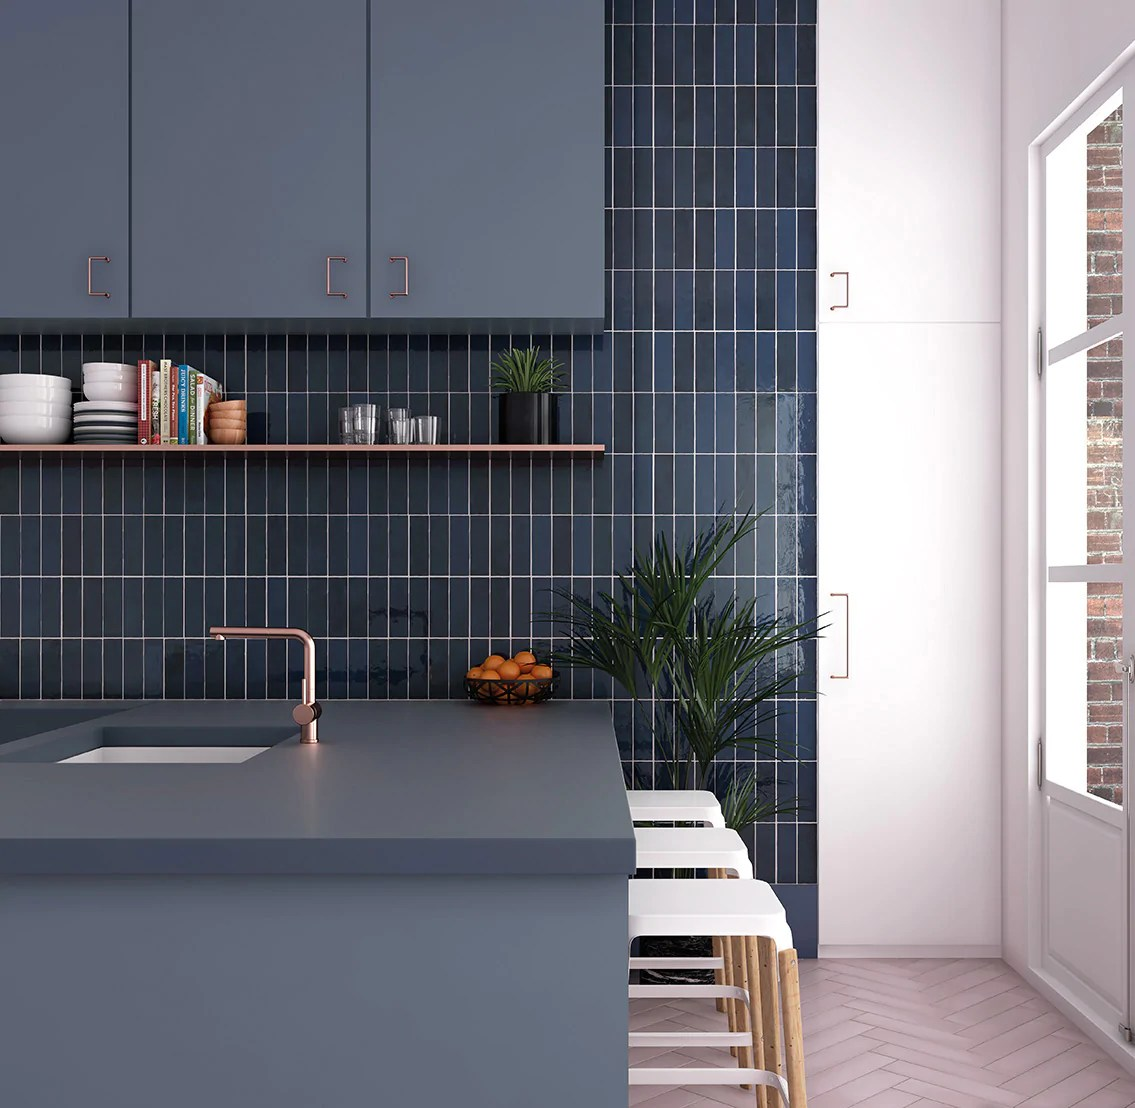 creative subway tile patterns and interior design ideas